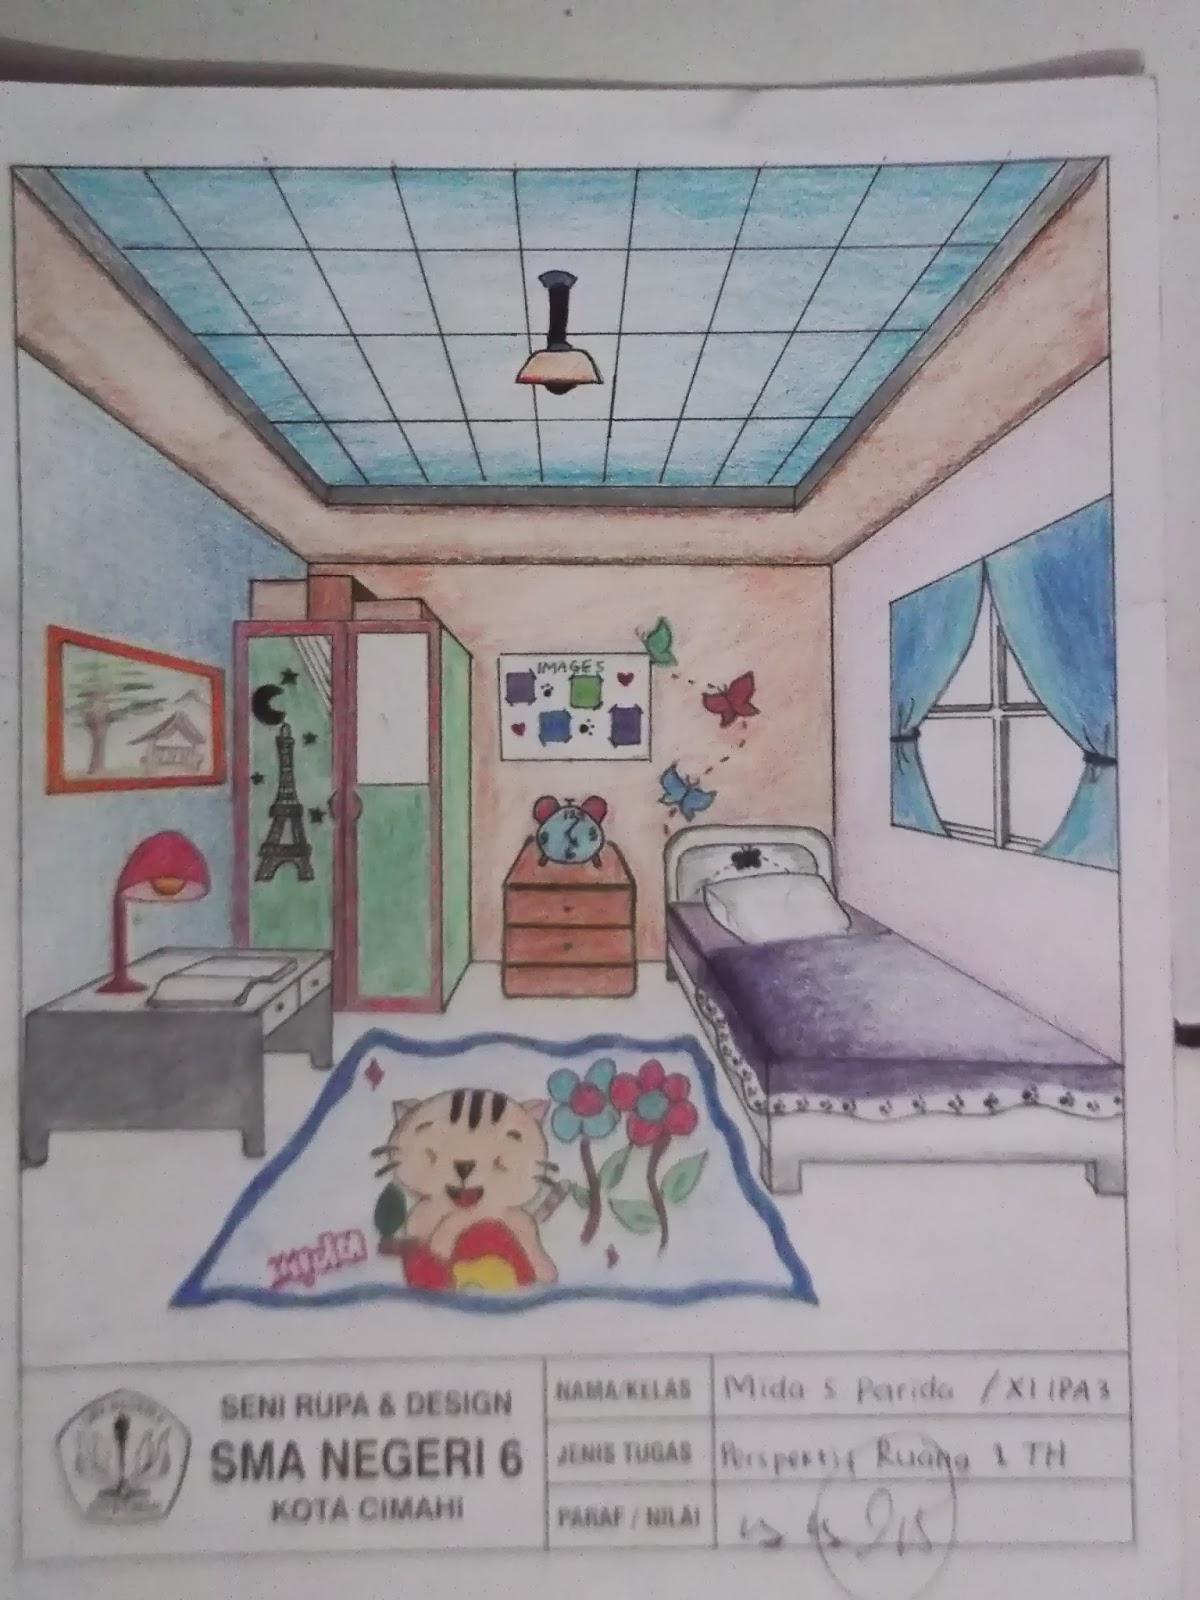 berbagi bersama doddi: Menggambar Perspektif